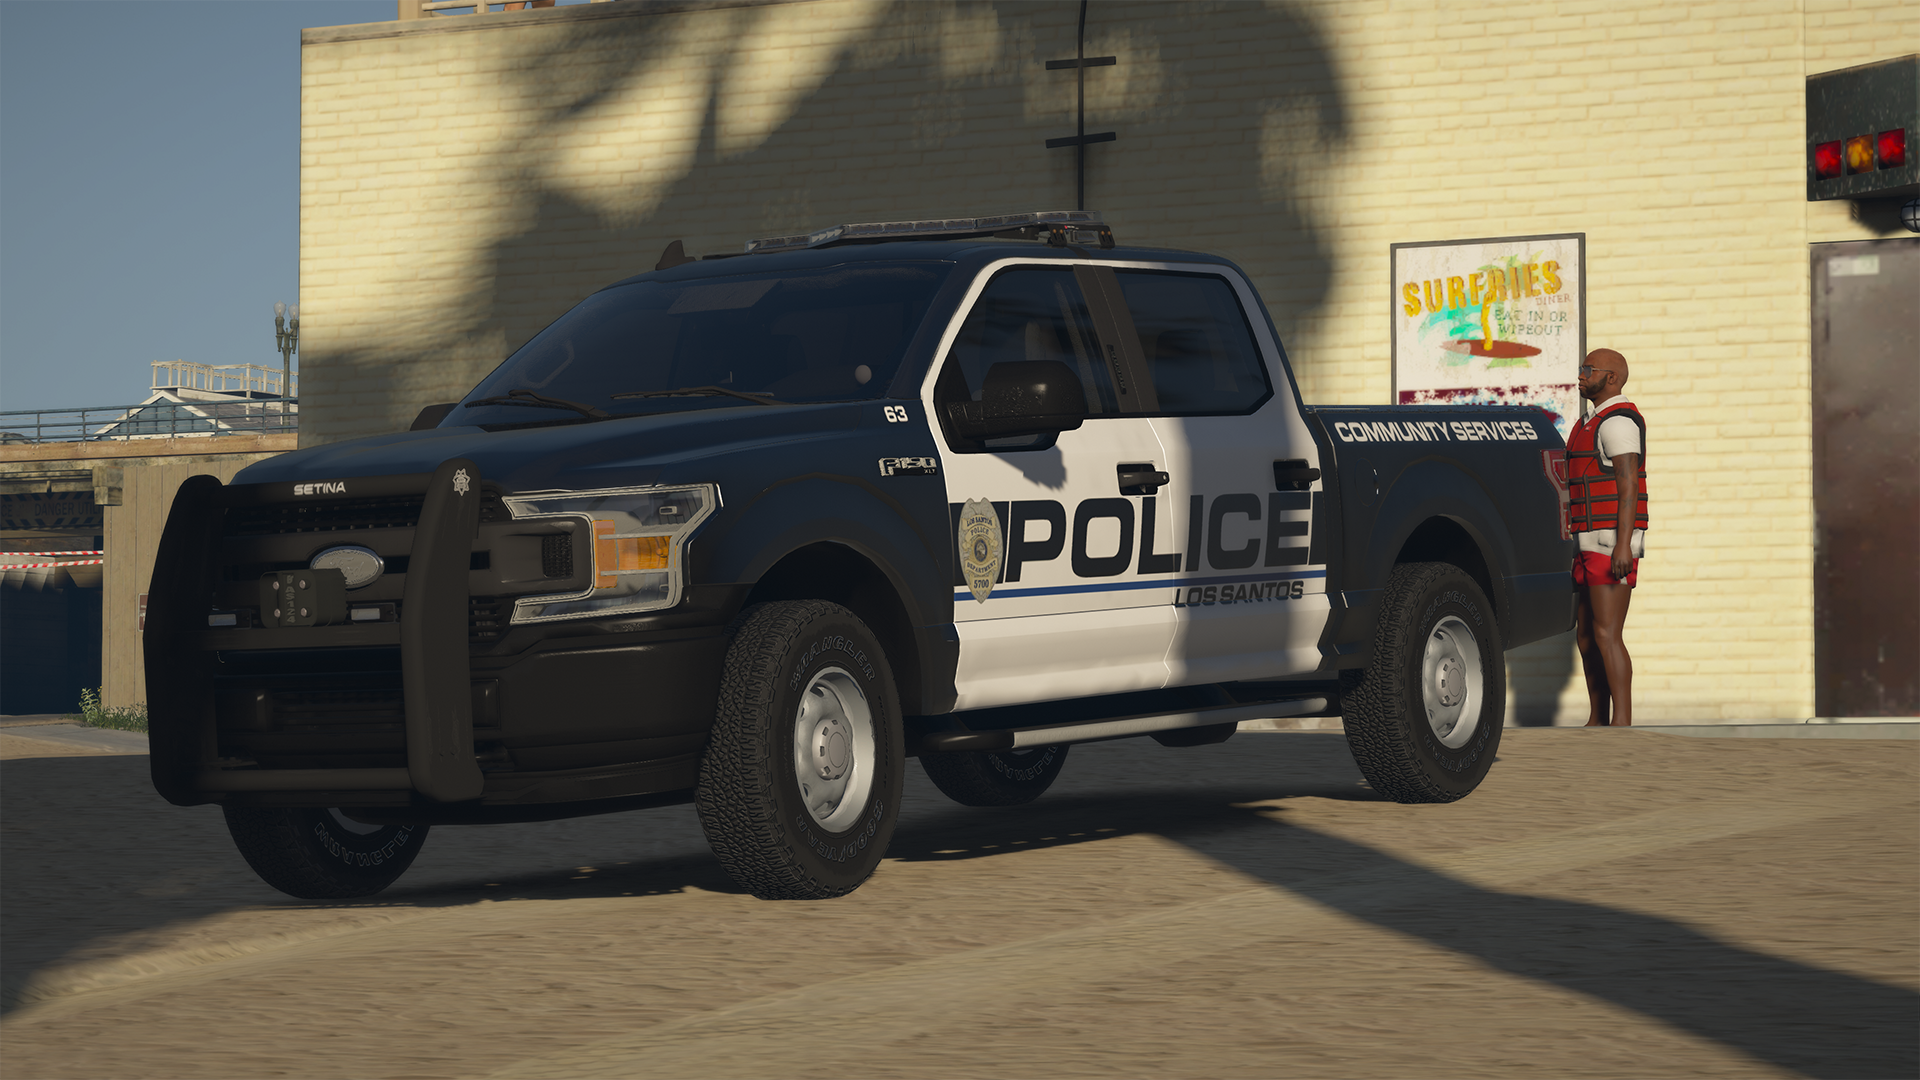 Grand_Theft_Auto_V_8_21_2020_12_10_17_PM.png.be1cf0ea34427440c5333ec39d160eec.png